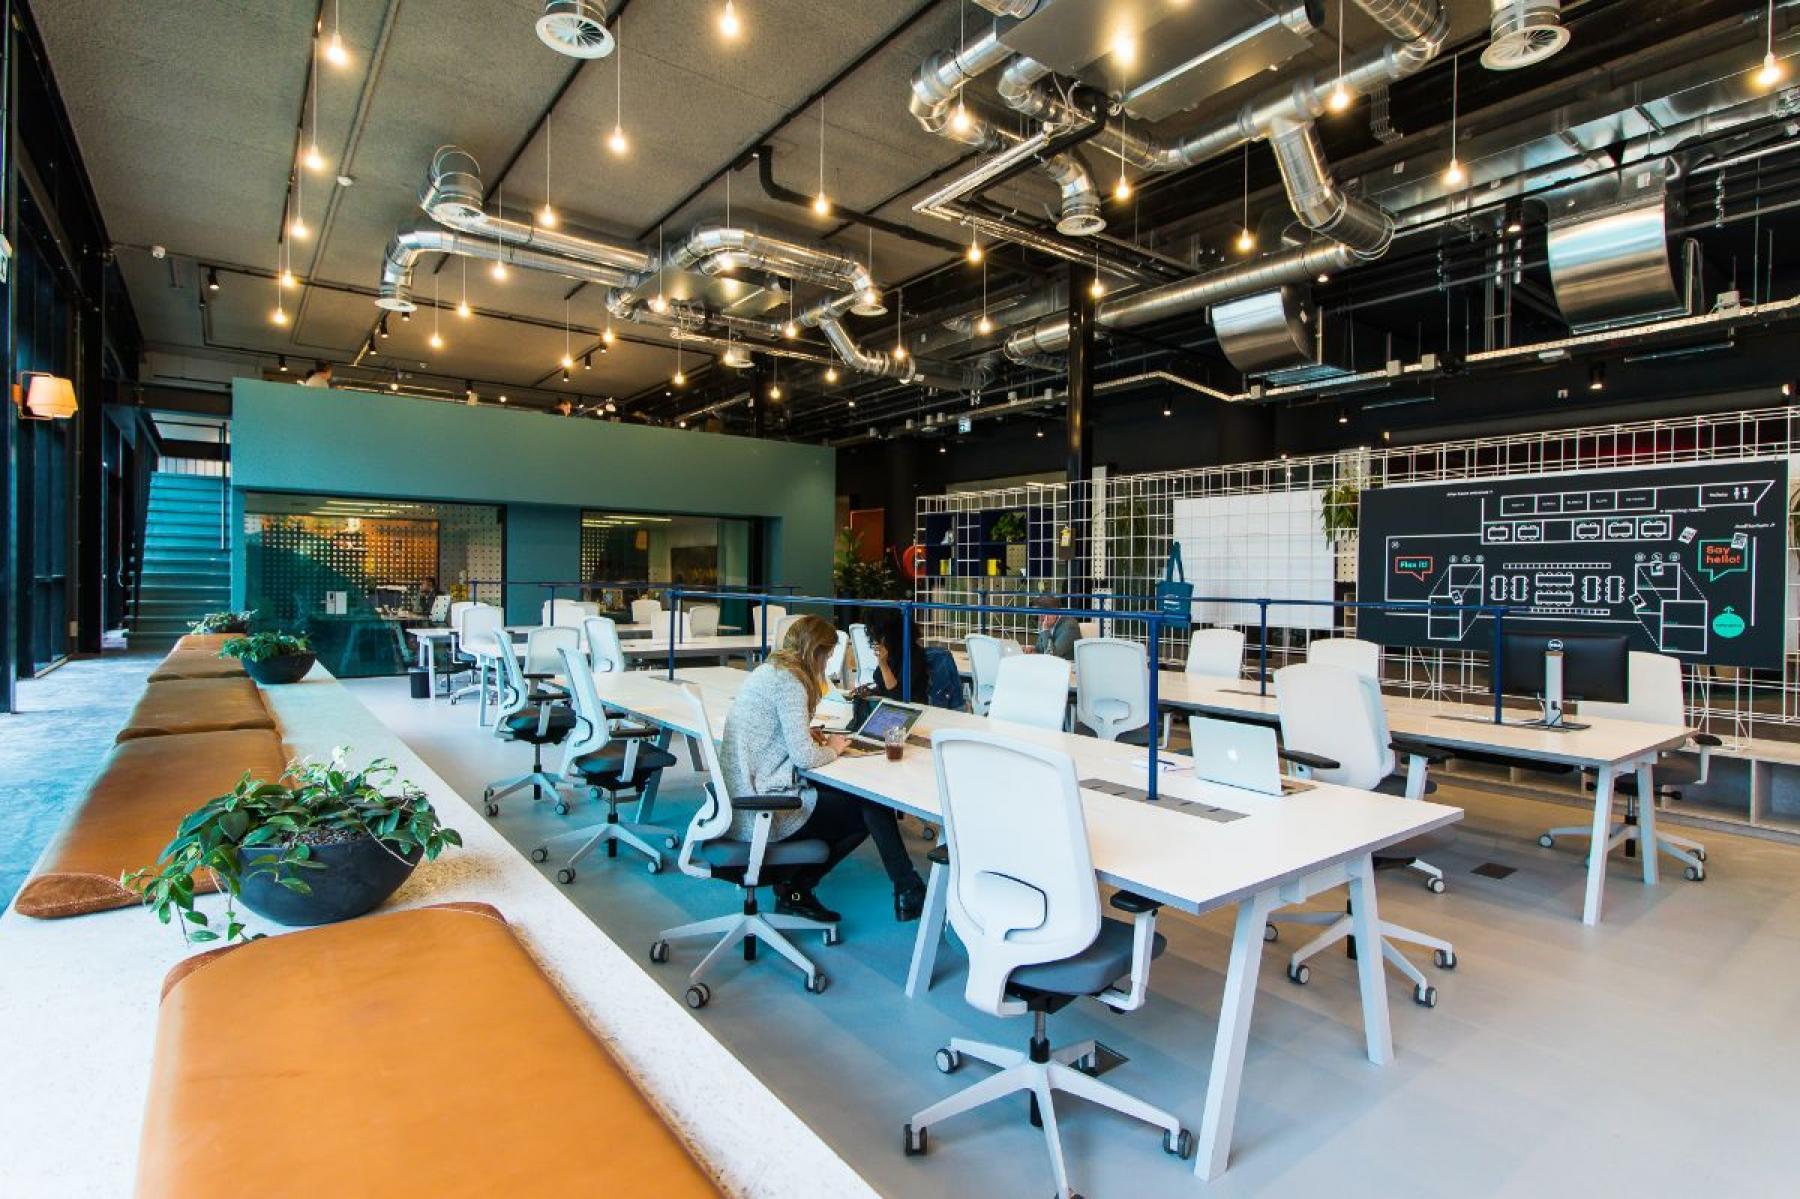 werkplekken kantoorgebouw amsterdam wibautstraat werknemer